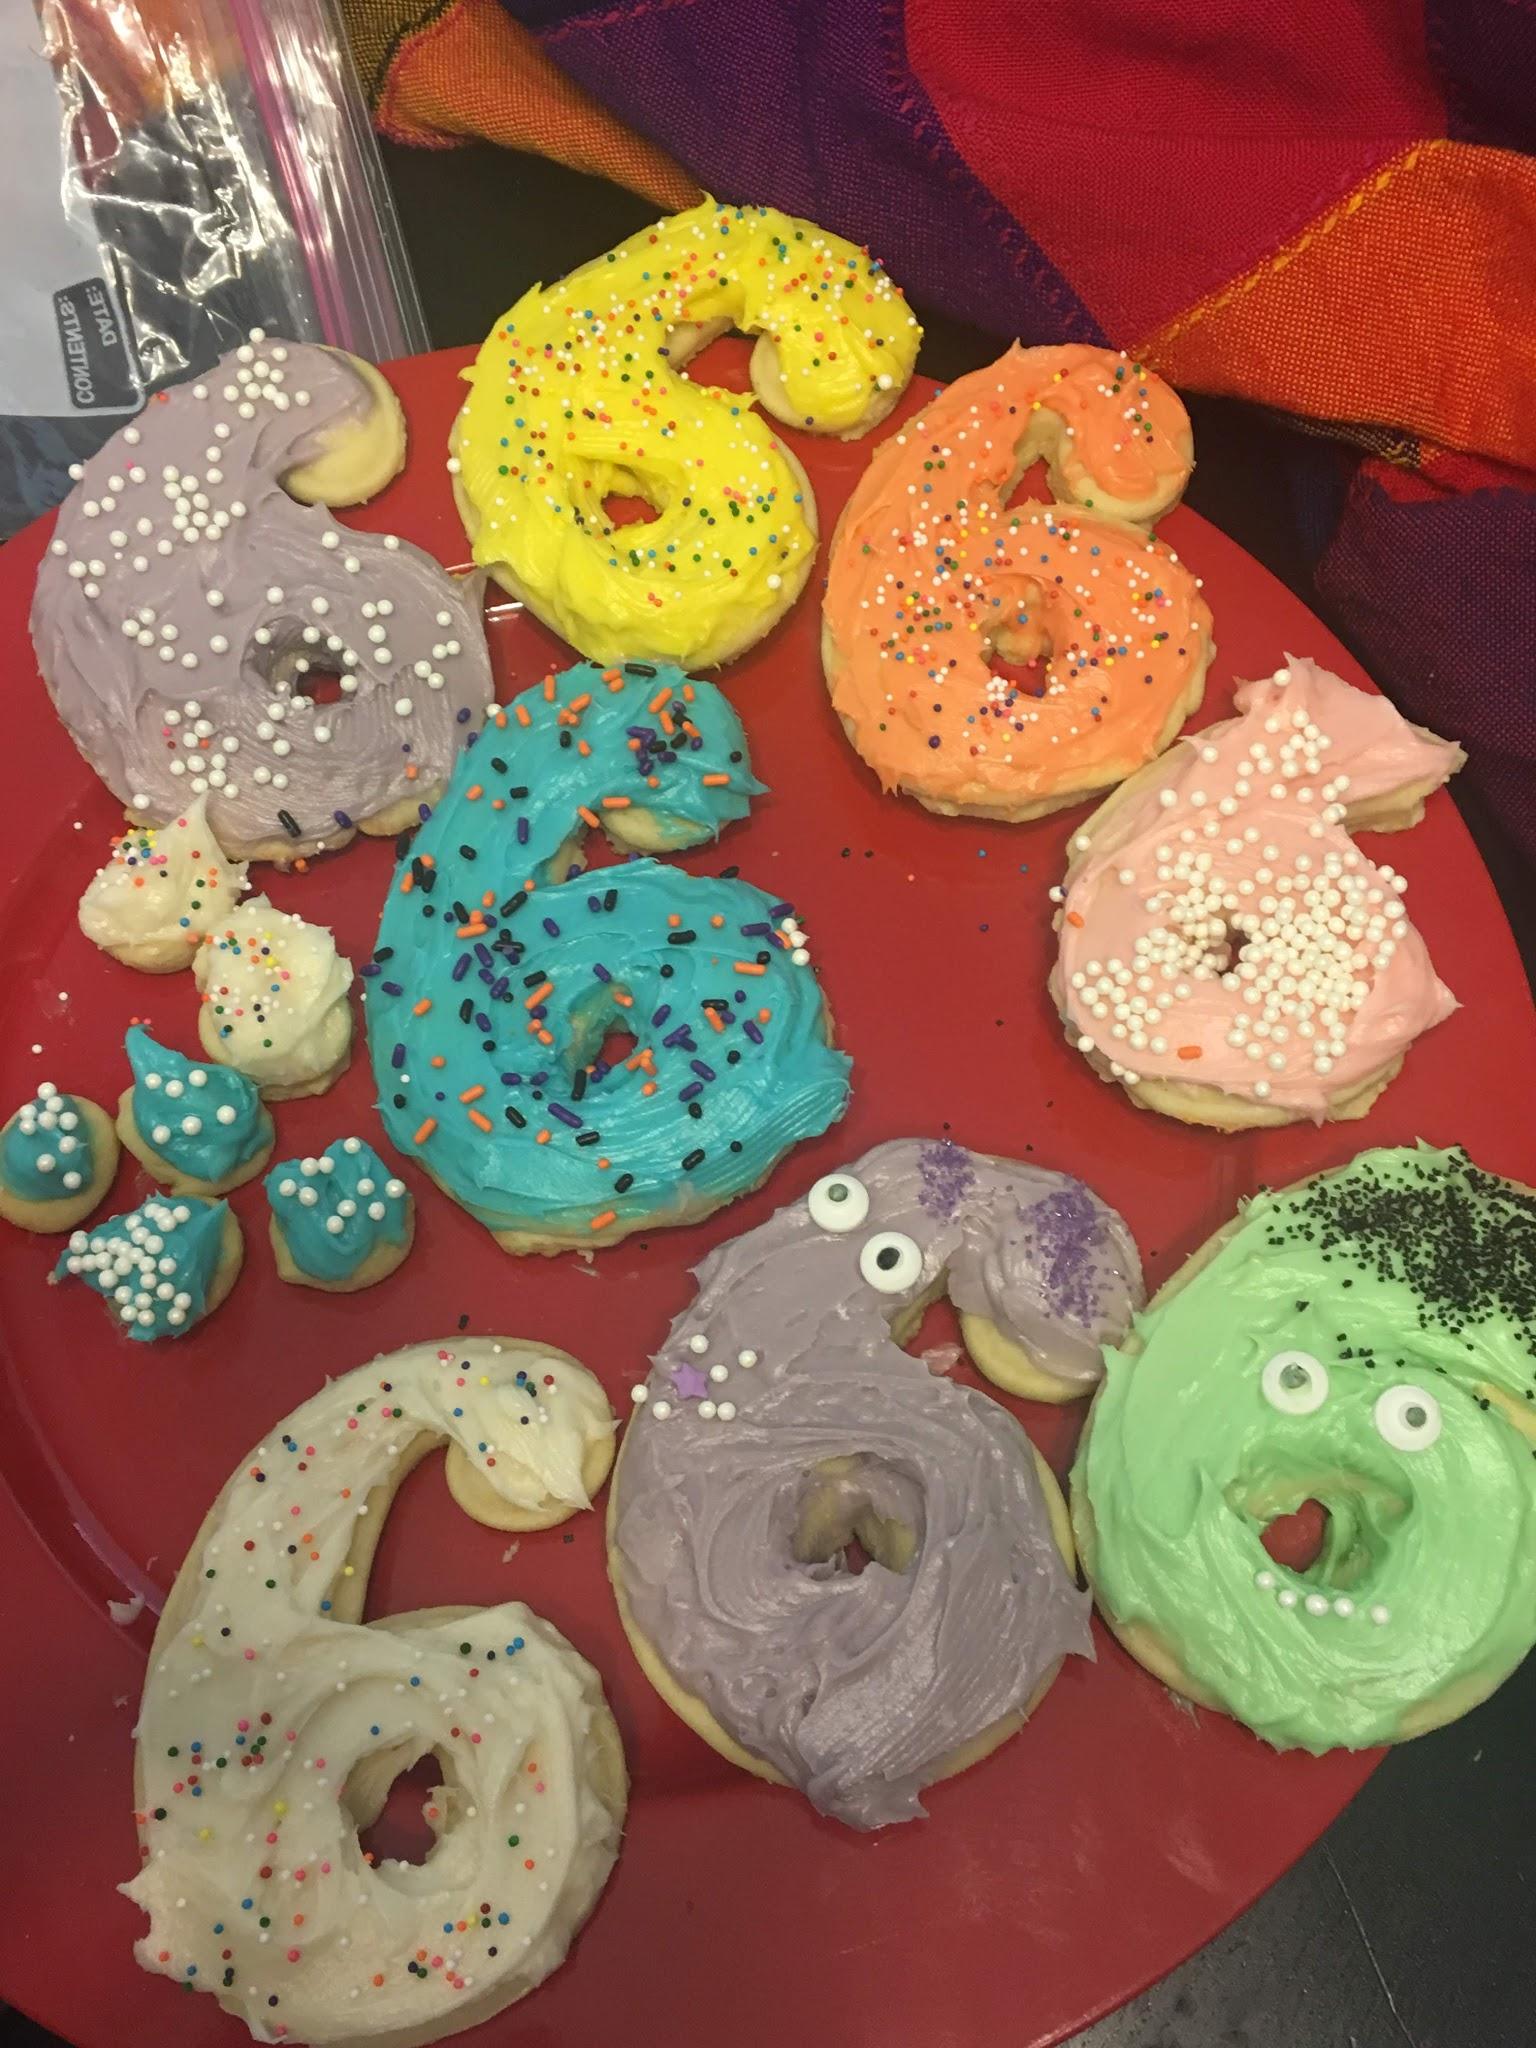 #6 Cookies for Mirah